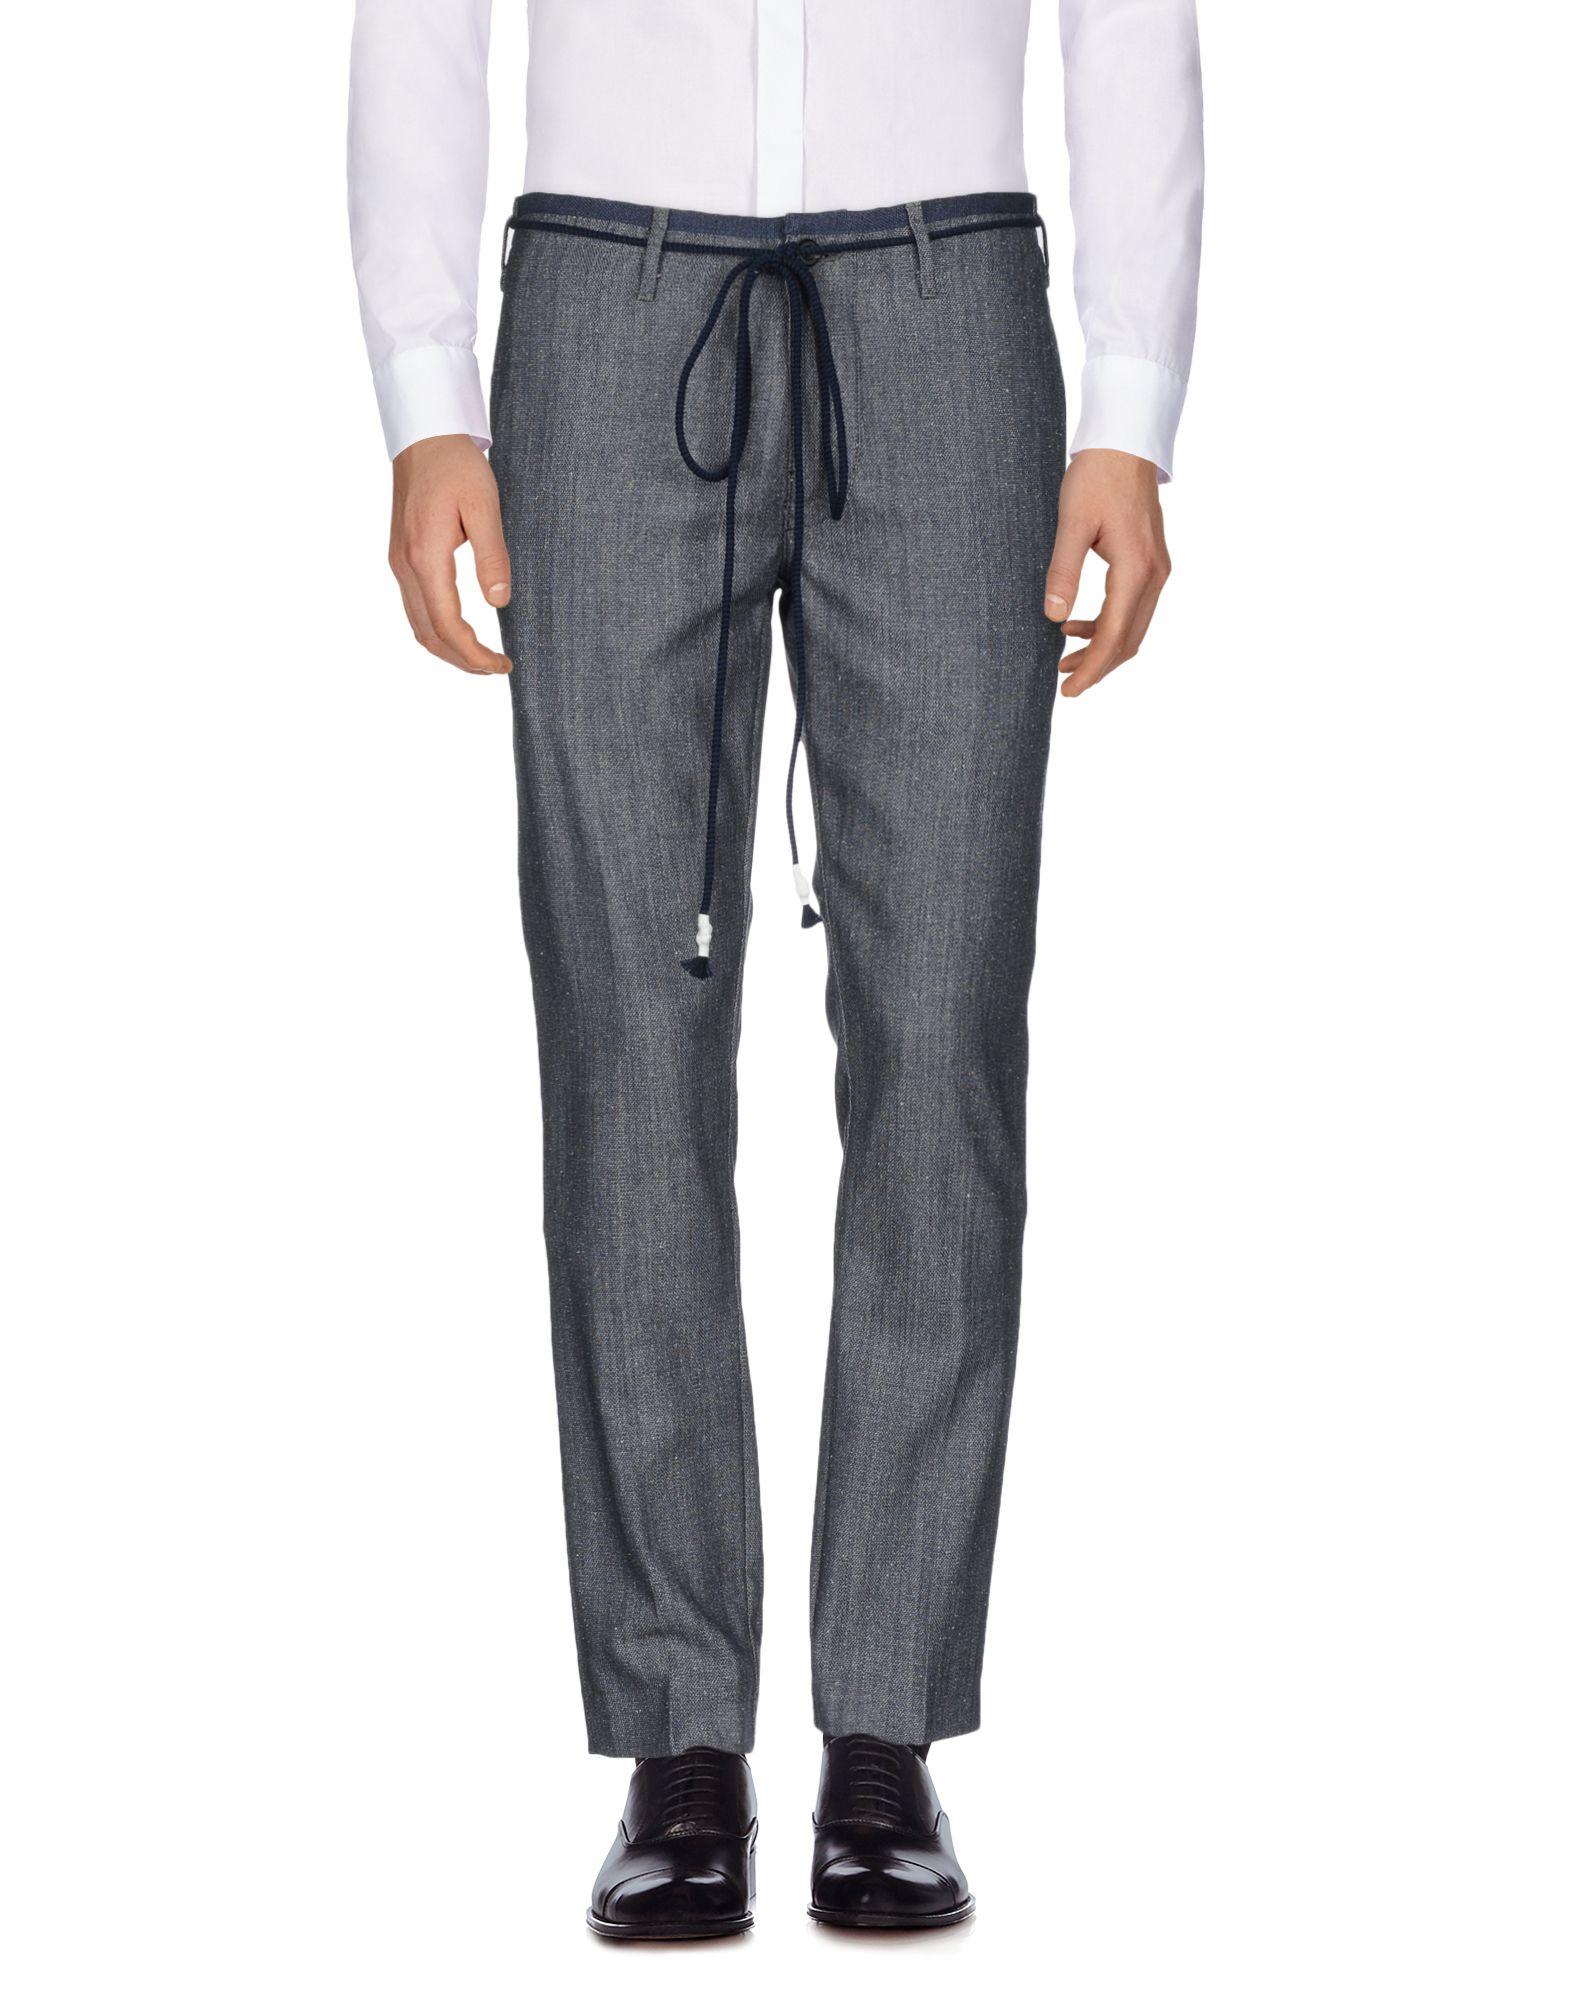 Pantalone Pence Donna - Acquista online su